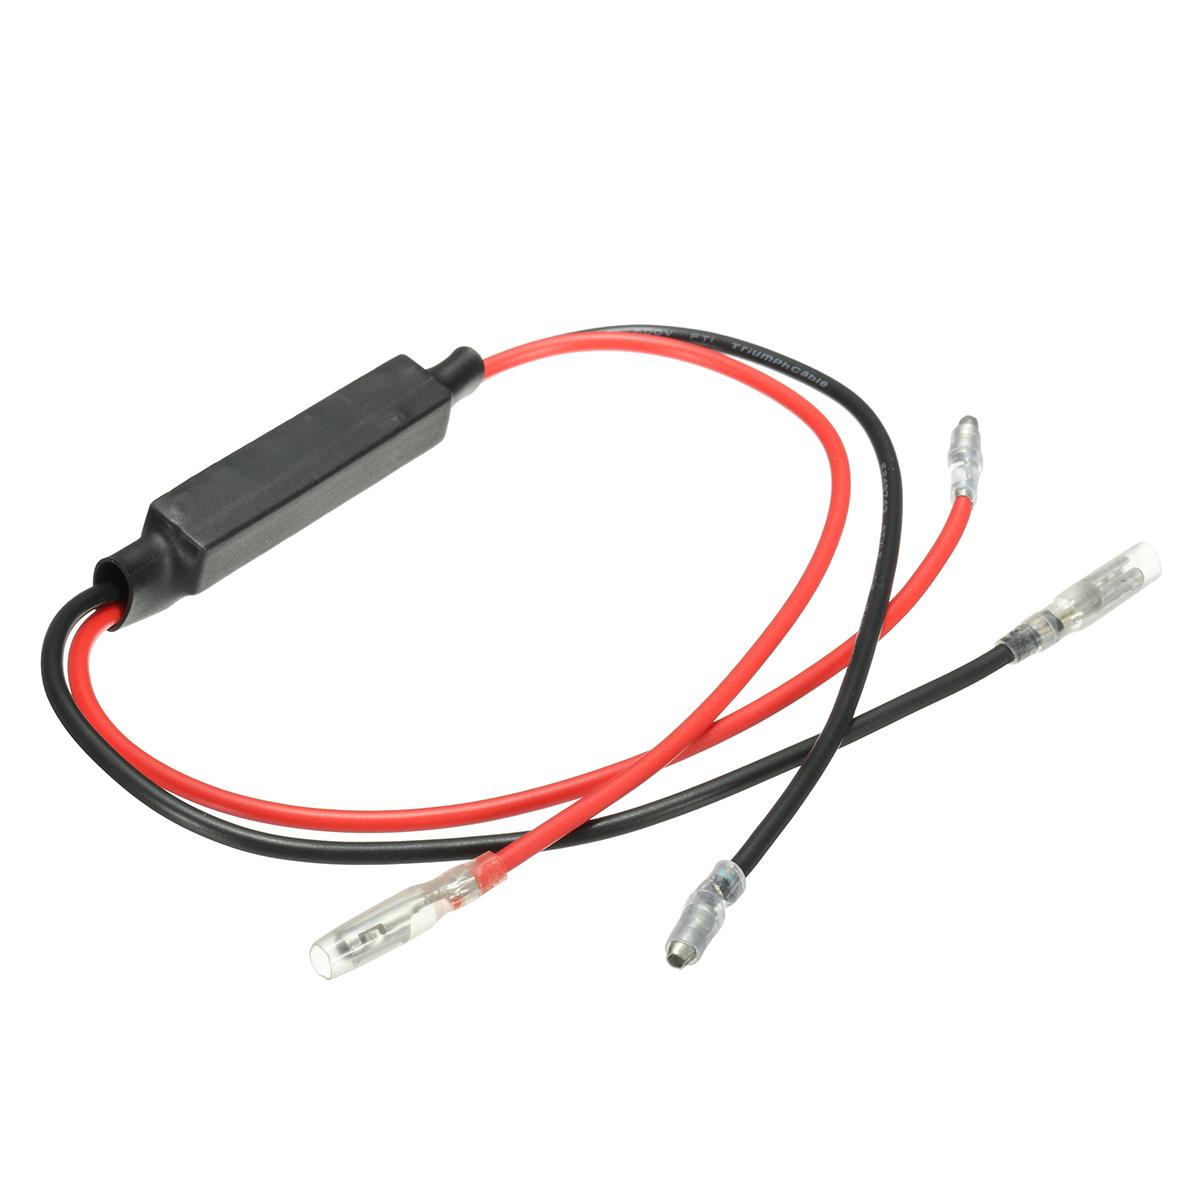 2pcs 12V 10W Flasher Indicator Load Resistor Motorcycle LED Light Flash Blinker